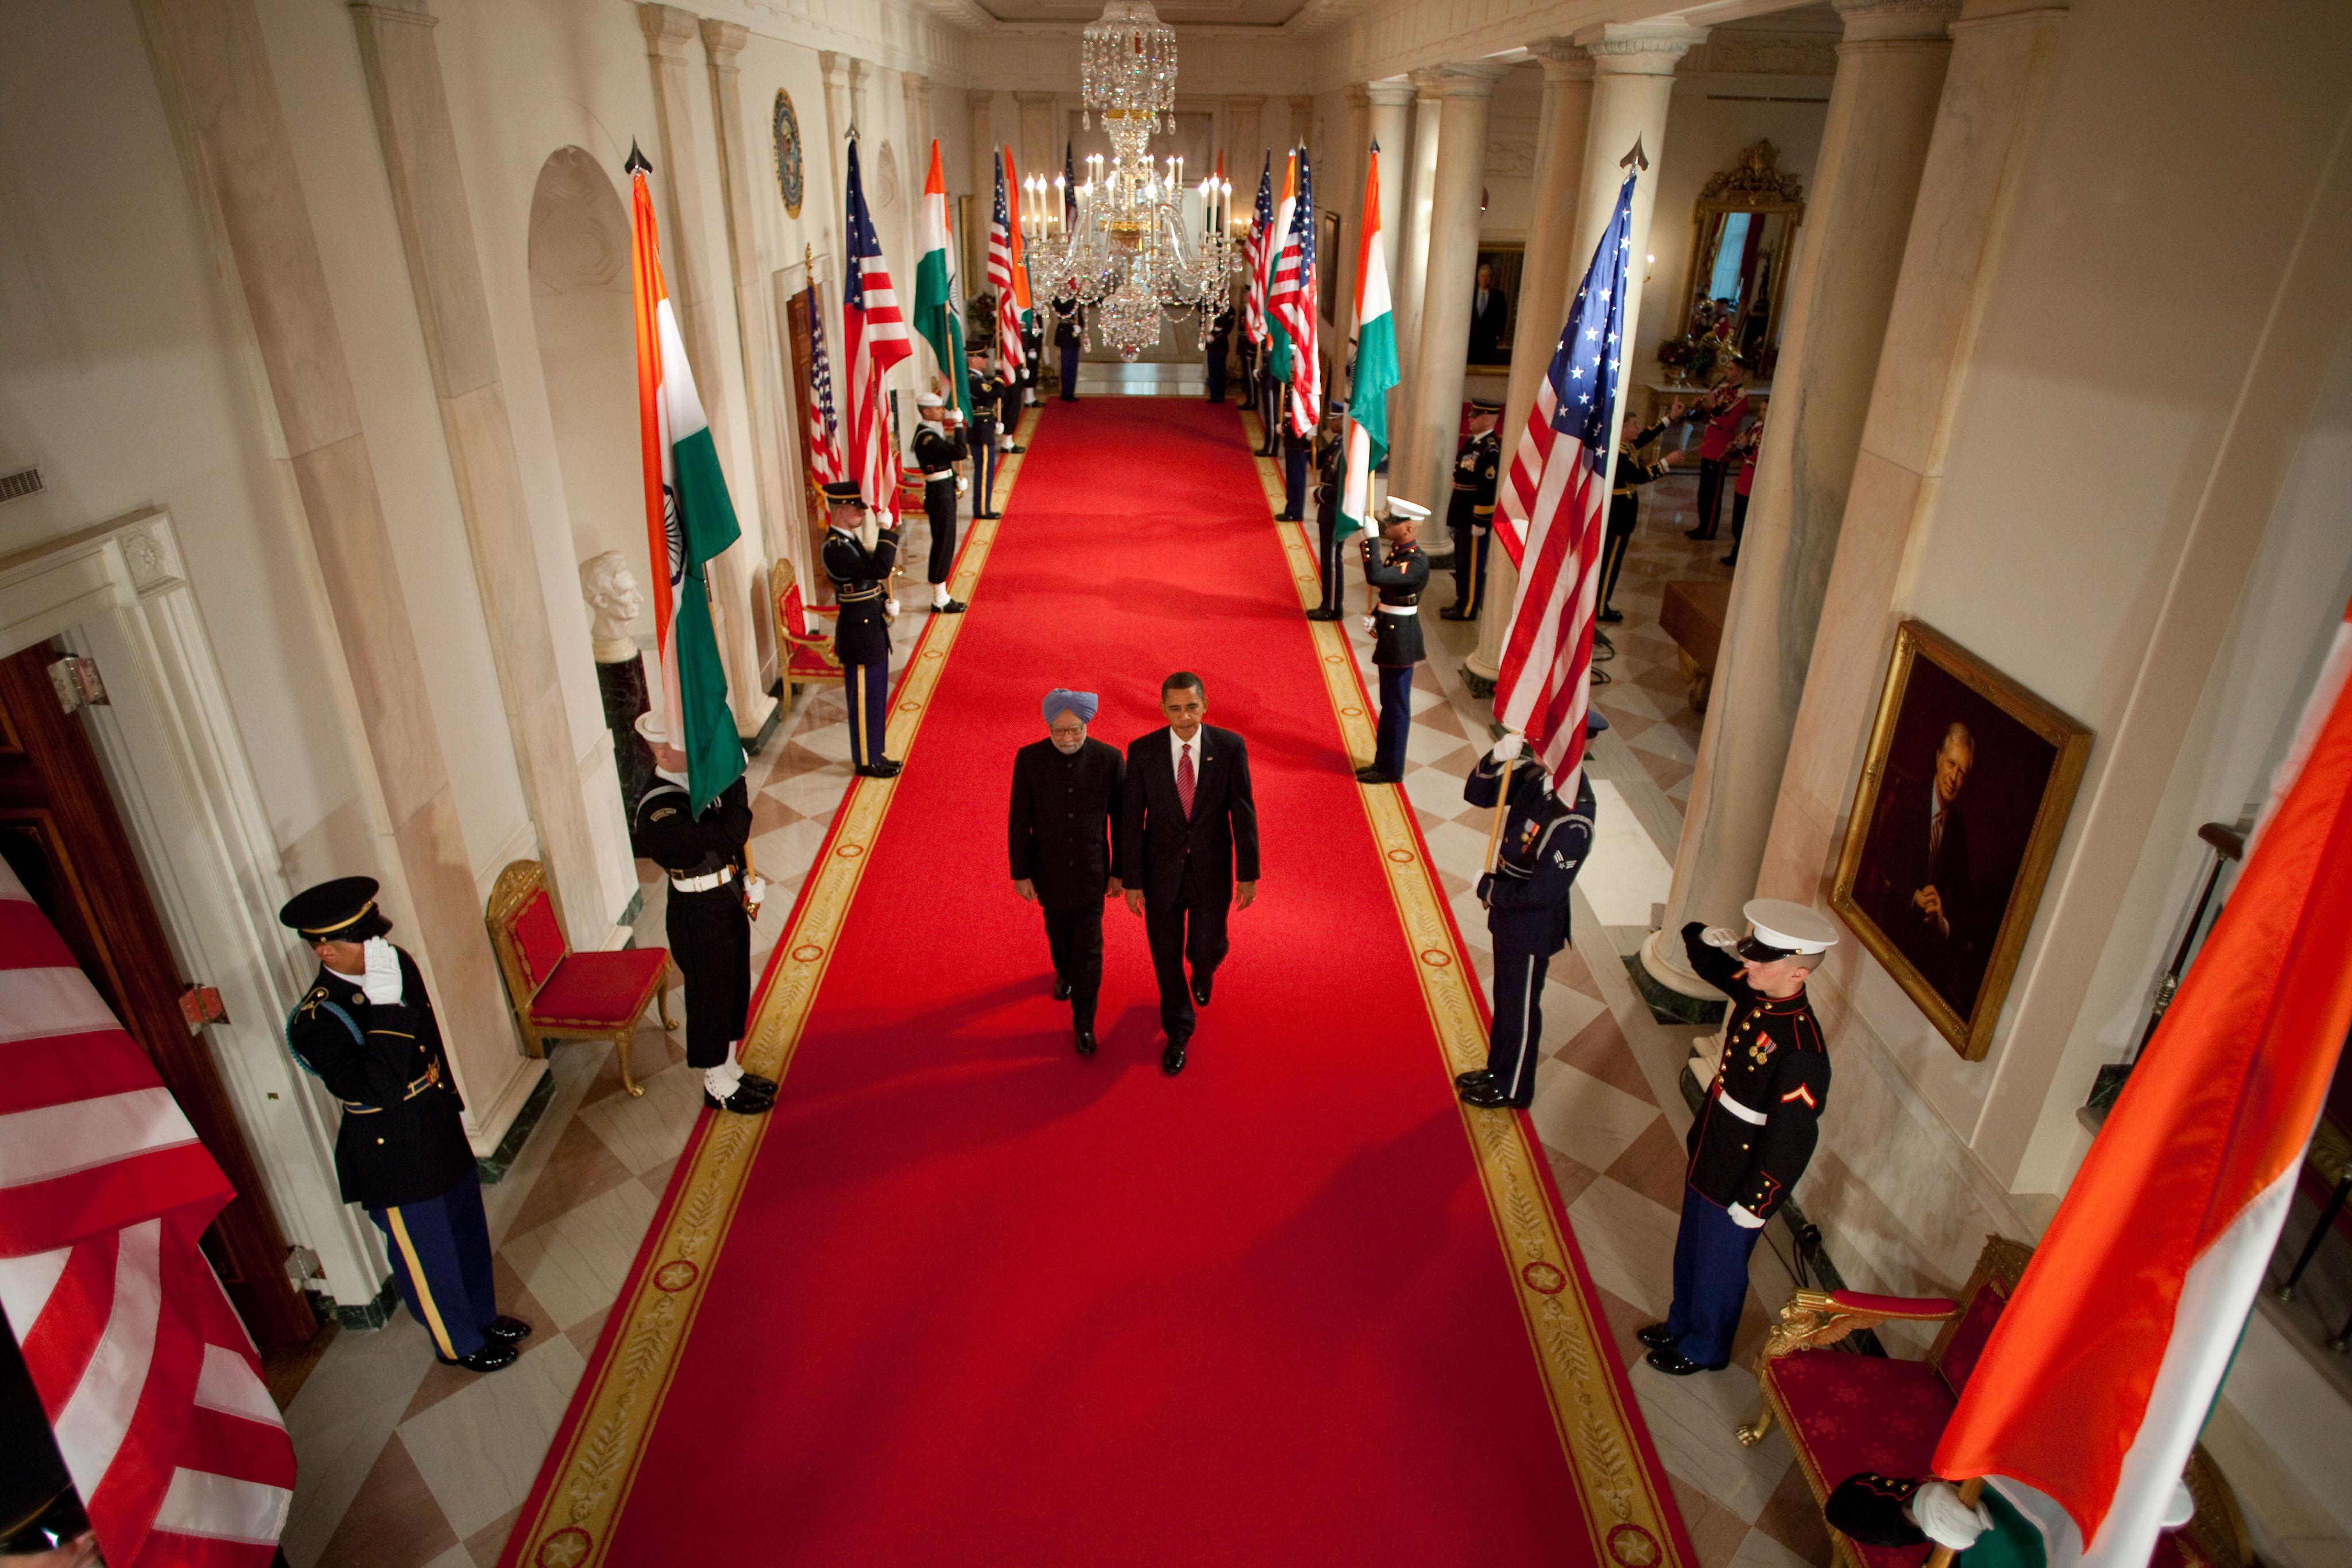 Presidents clipart prime minister #9